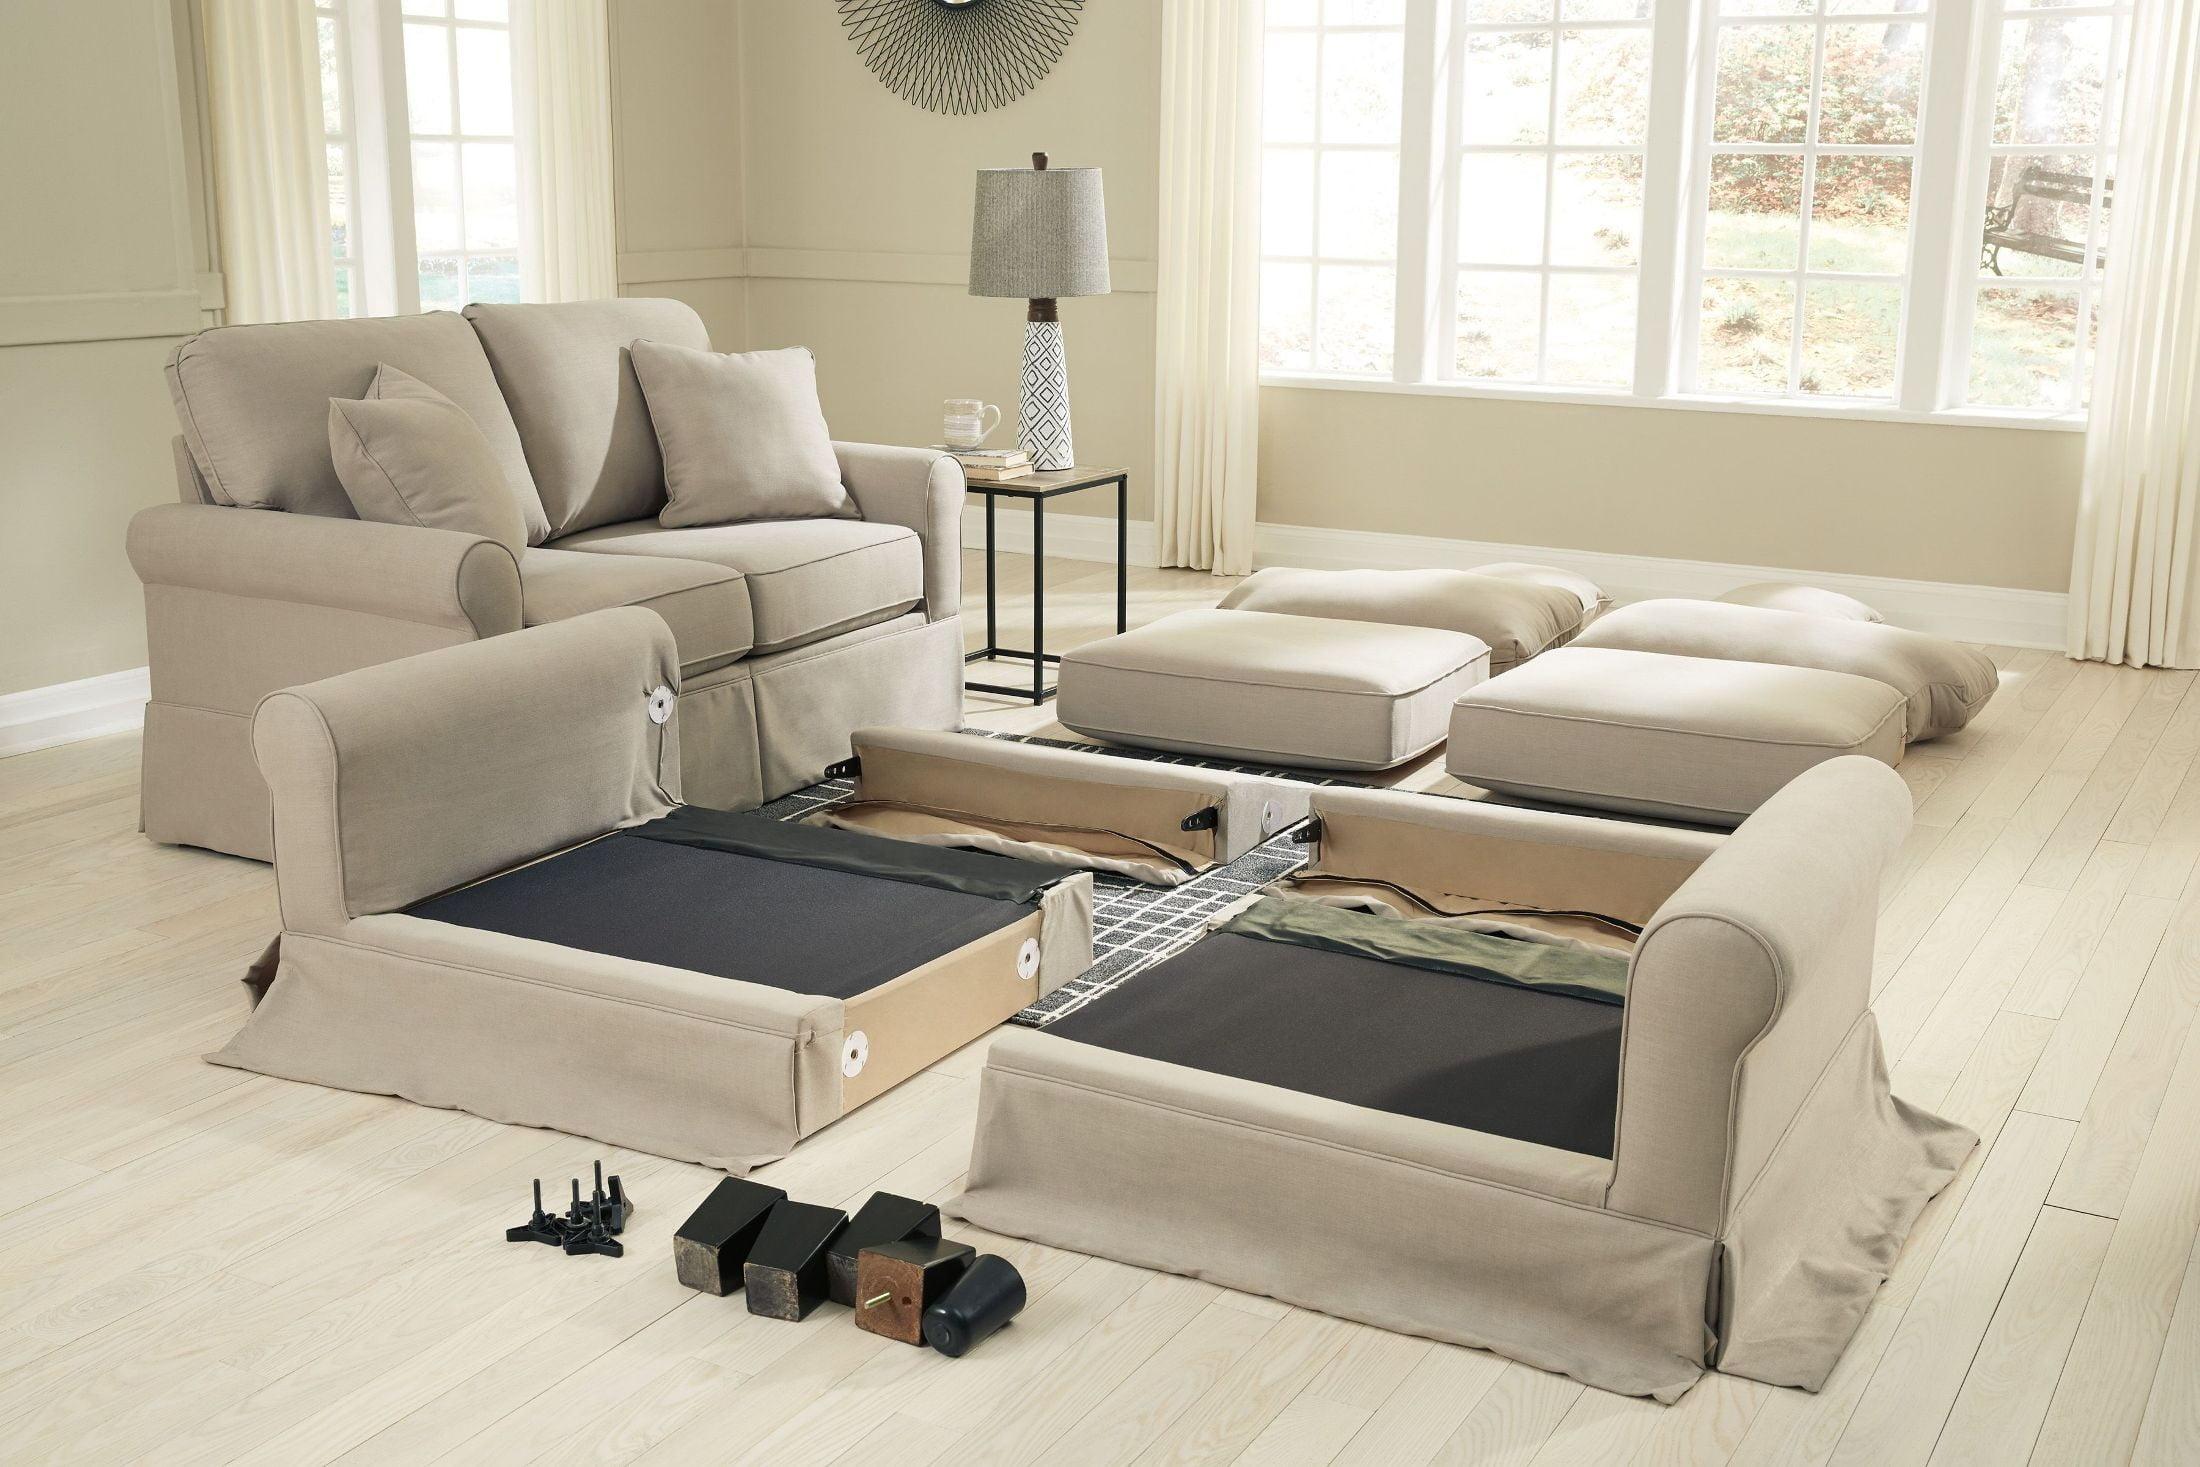 Senchal Stone Living Room Set from Ashley | Coleman Furniture